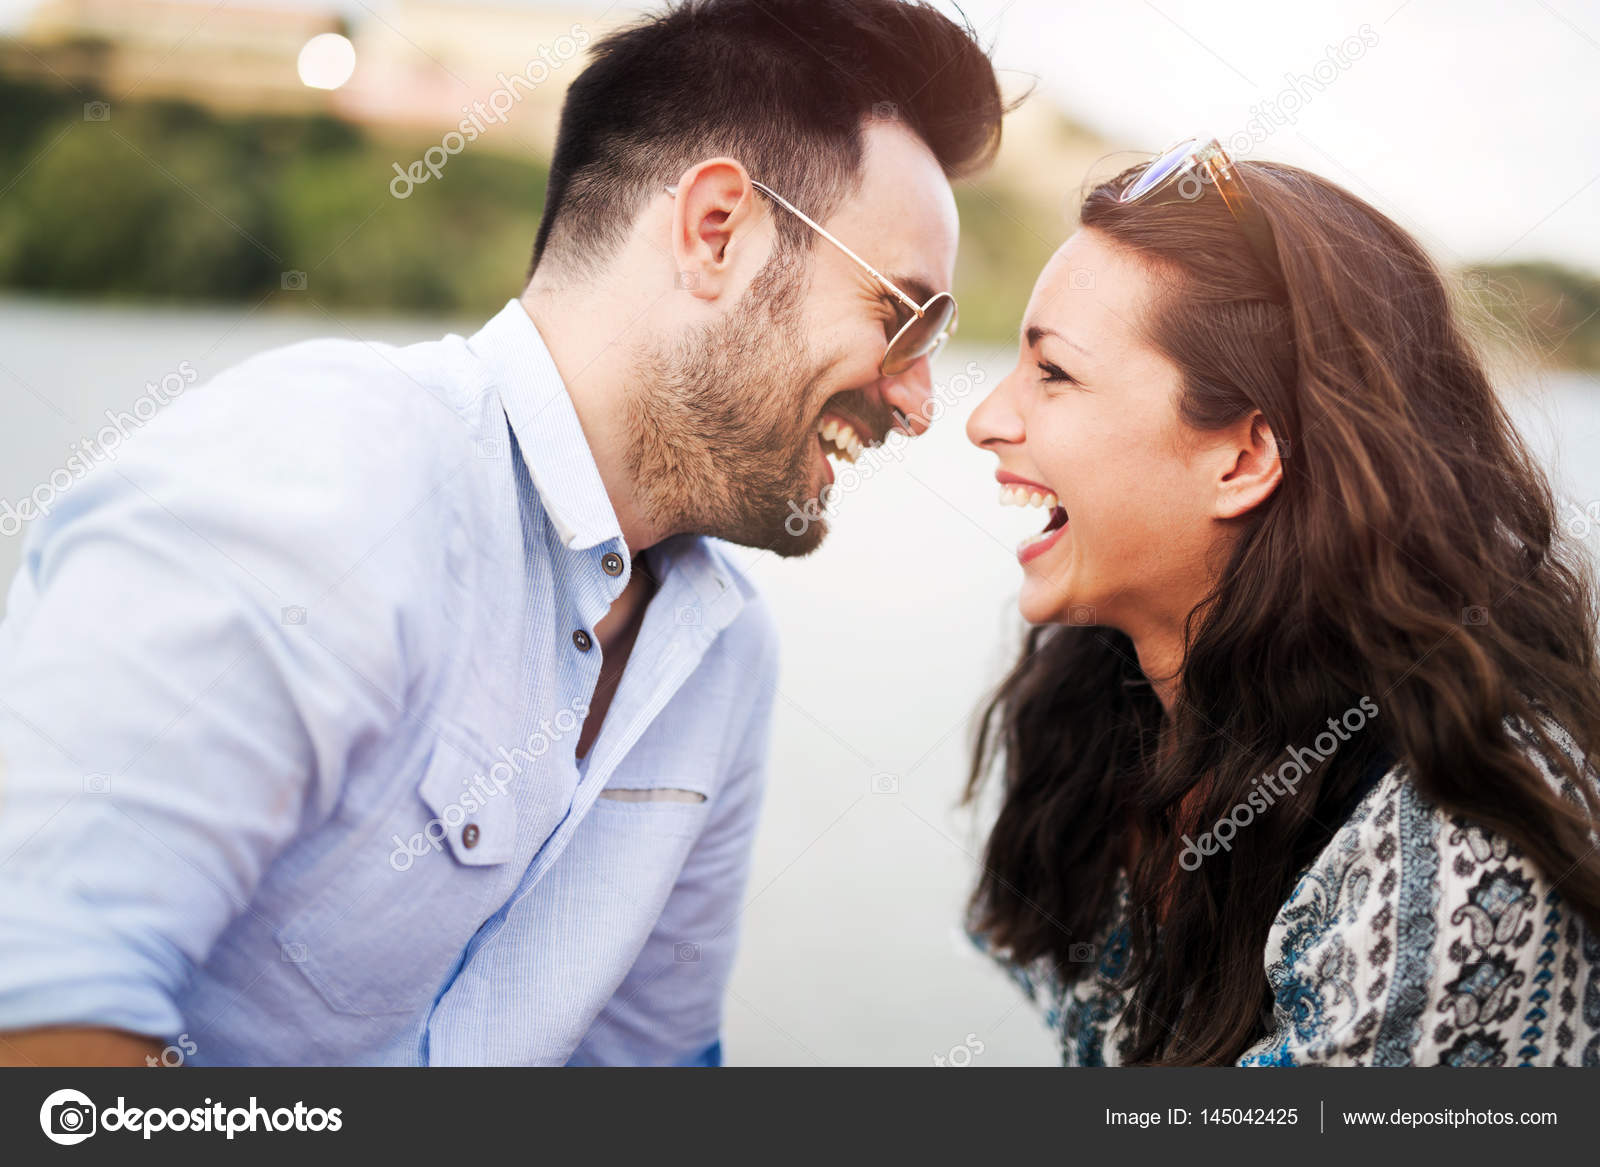 dating o flirteo